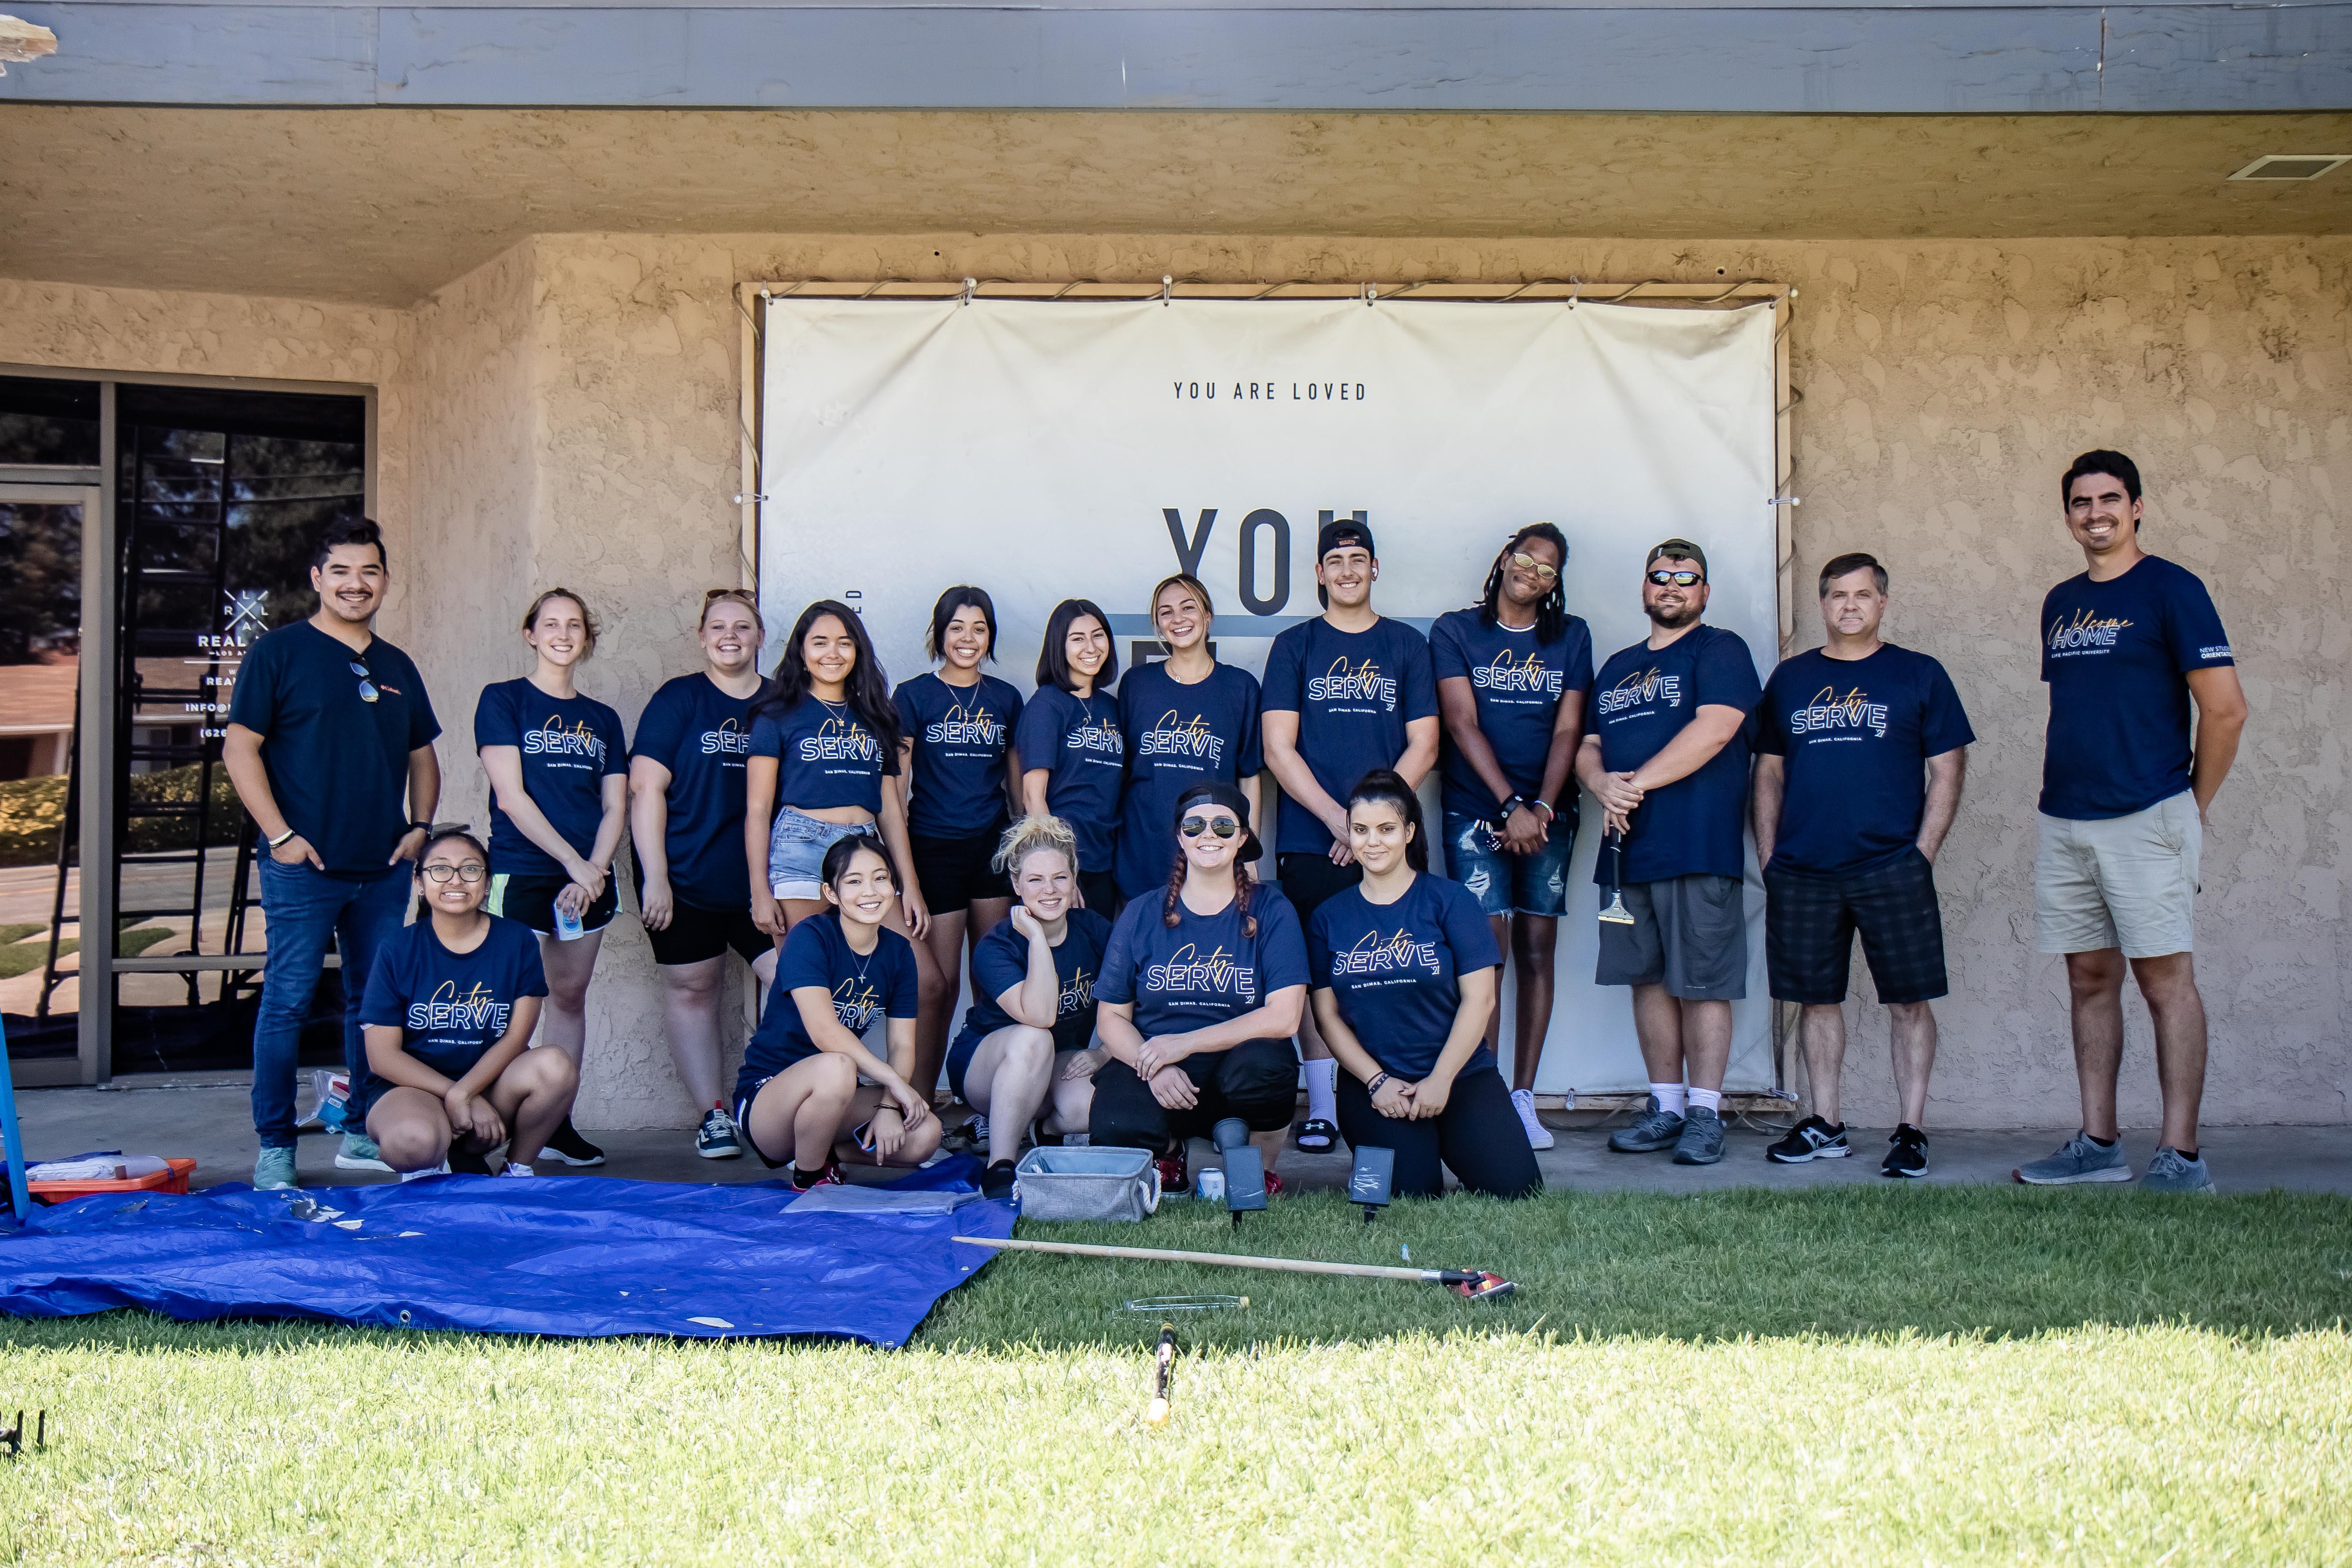 Group photo of LPUs City Serve team